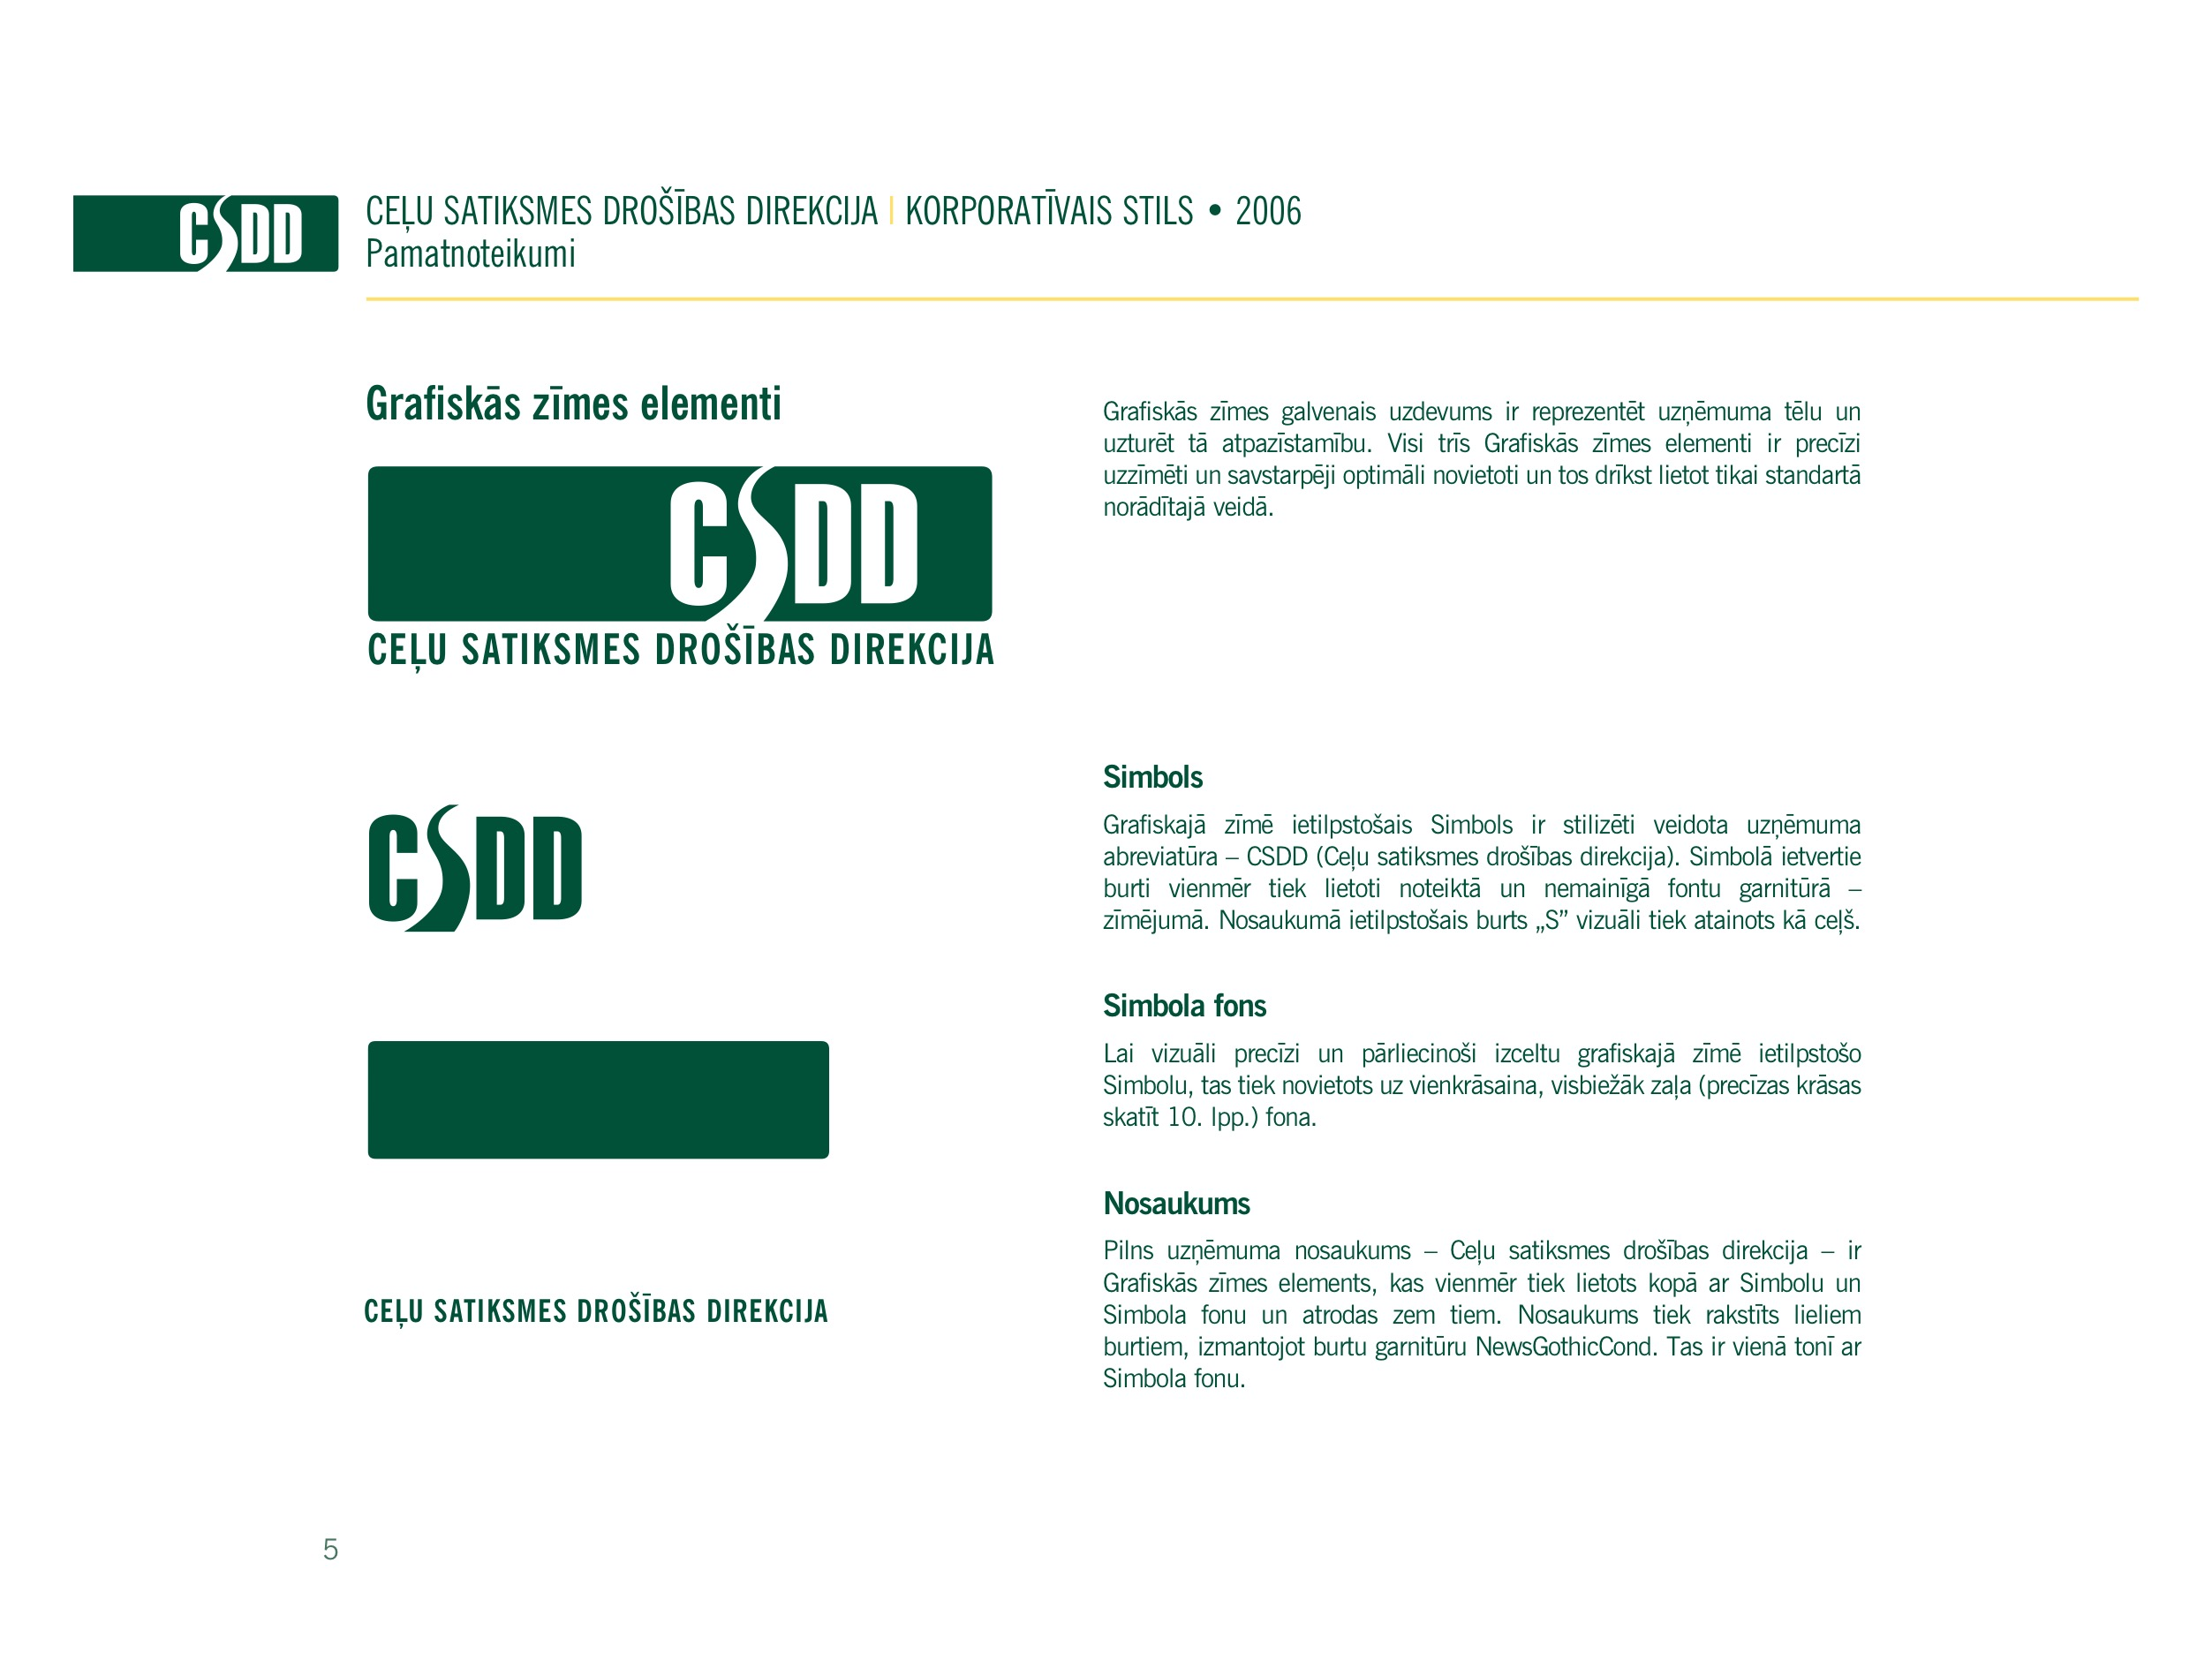 CSDD_stils 5